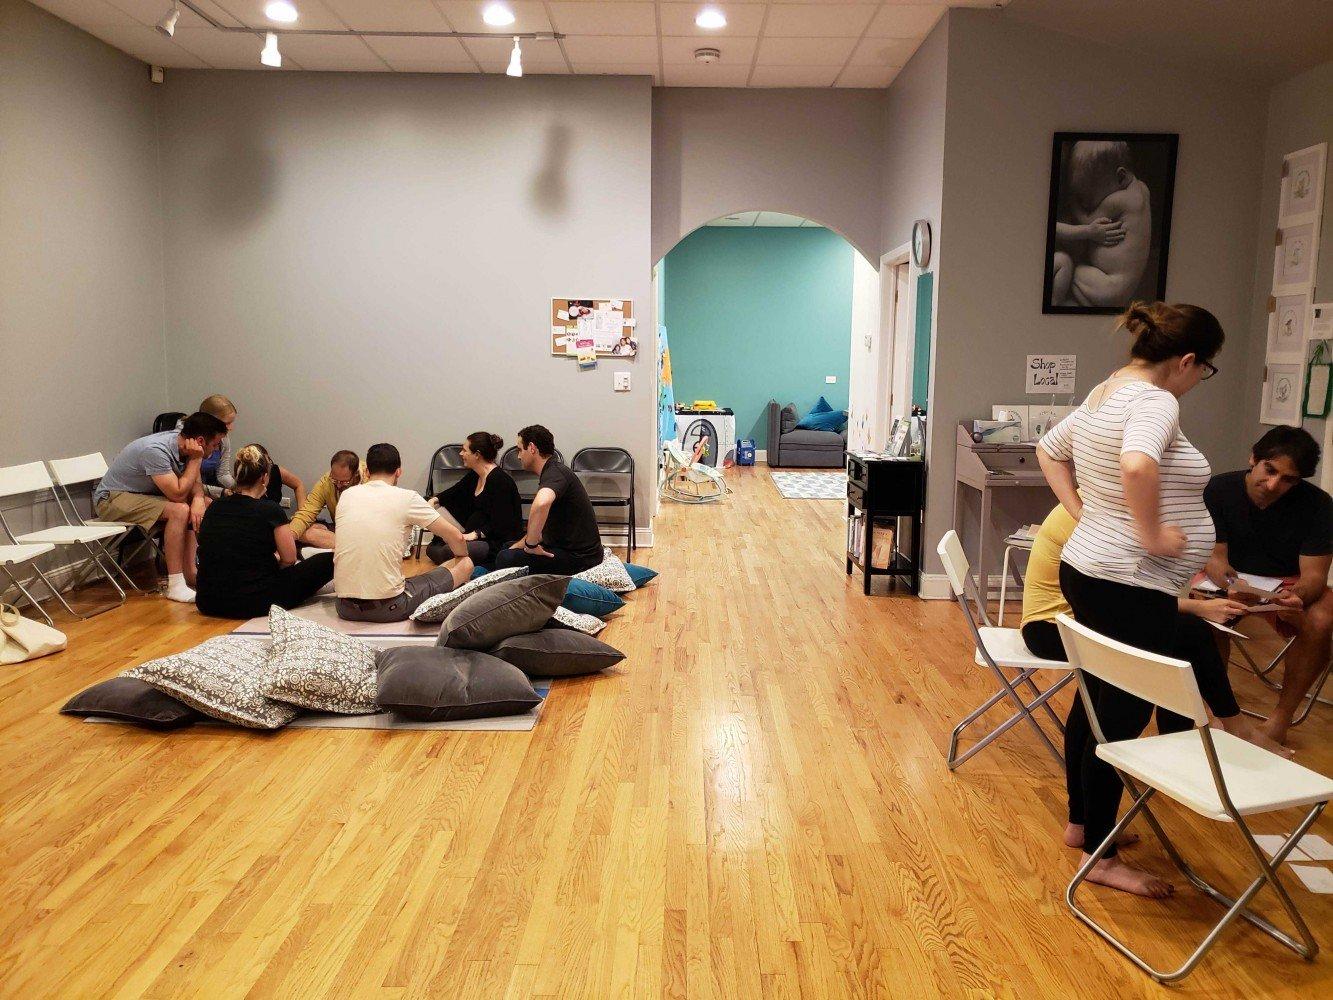 weekend childbirth class